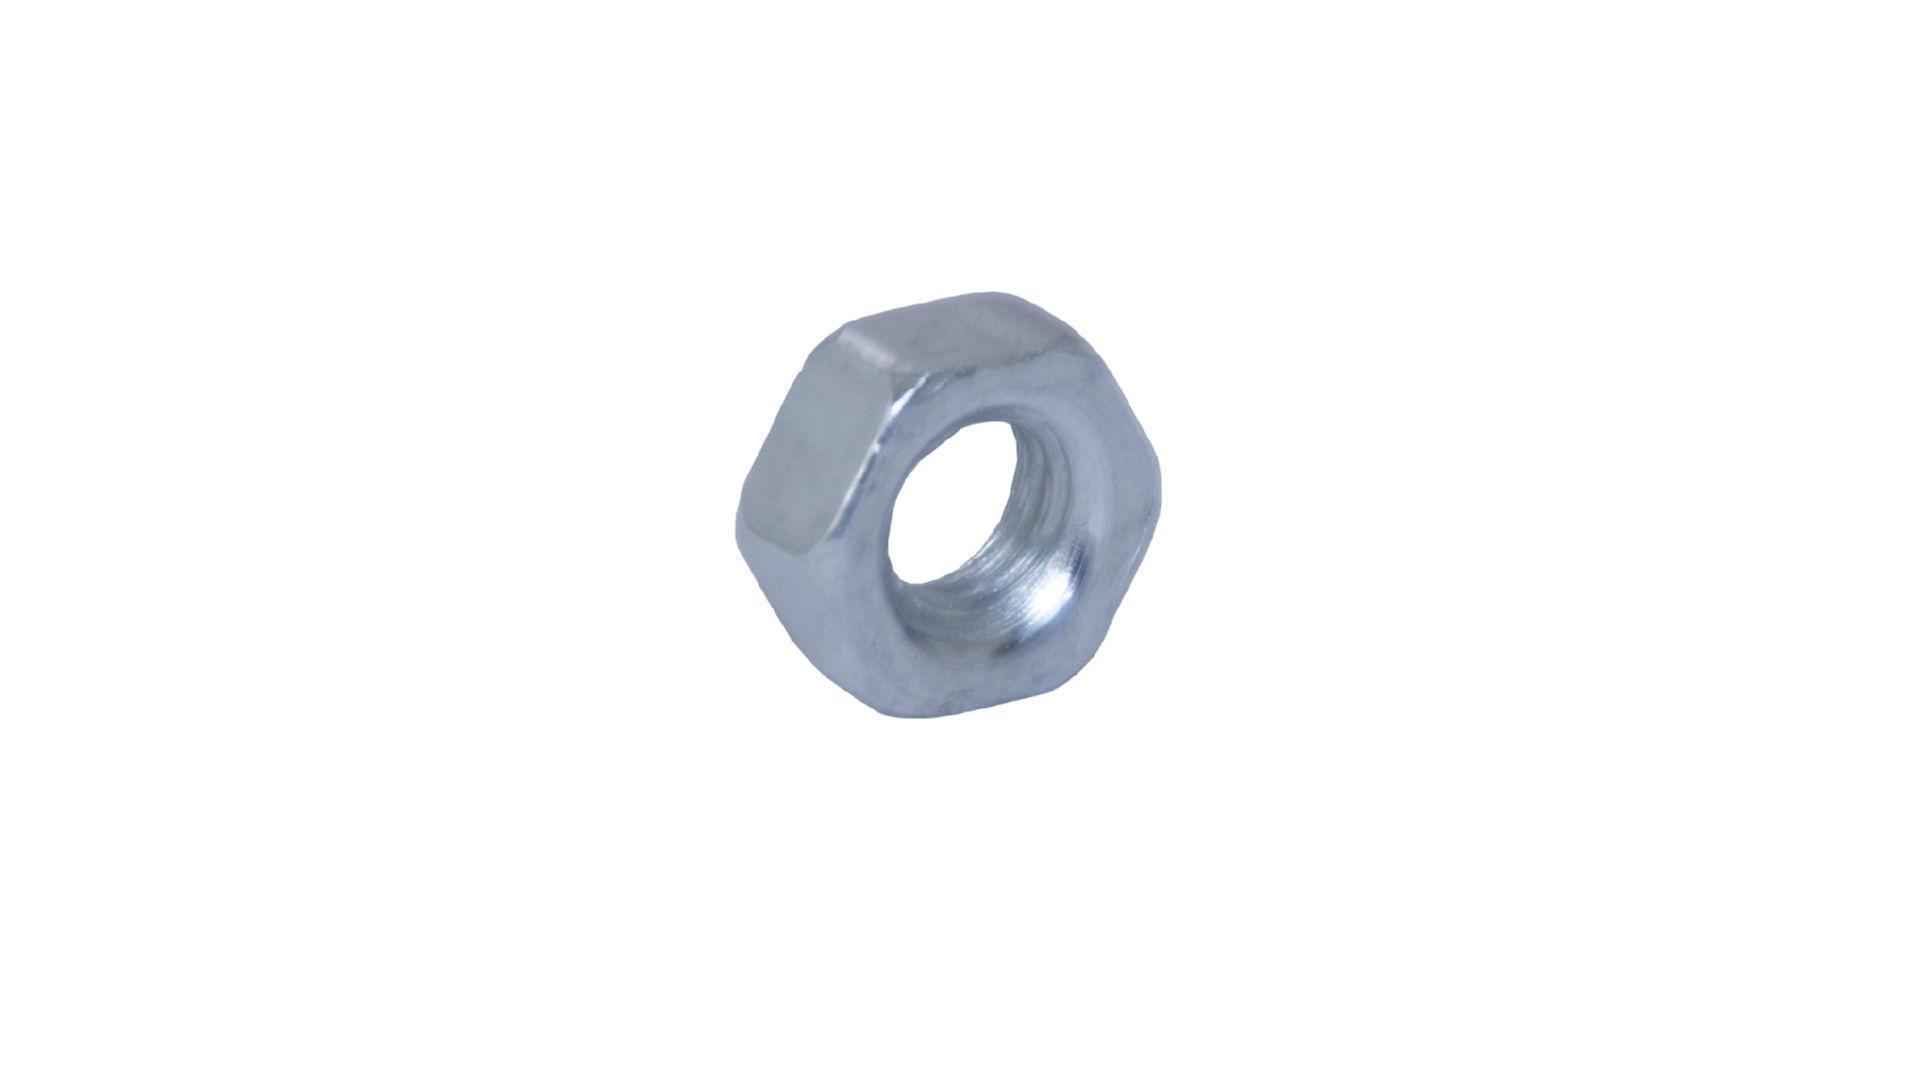 Гайка шестигранная Apro - М4 DIN 934 (400 шт.) 3